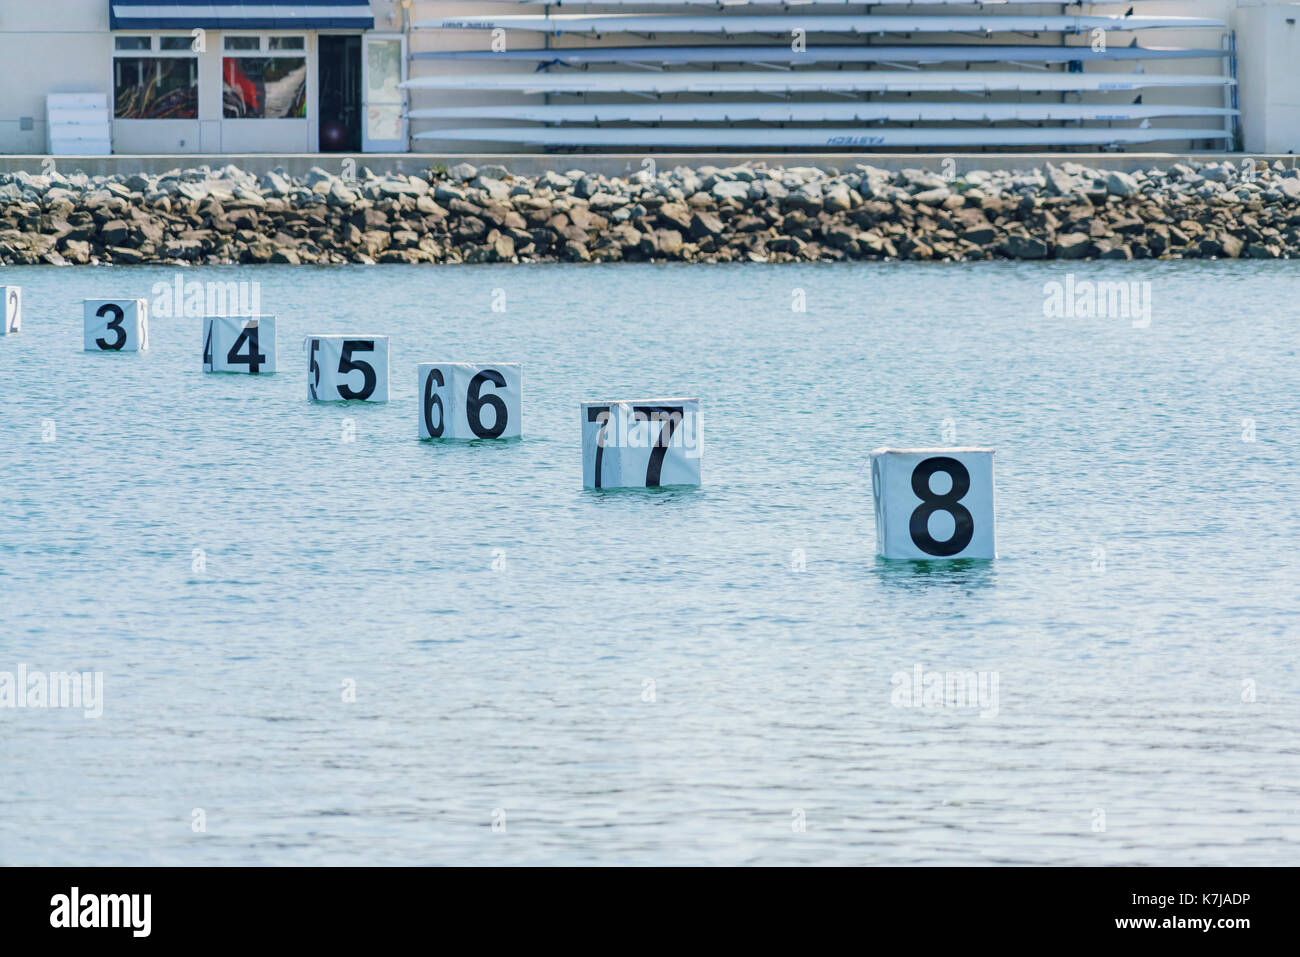 Concorrenza dragonboat traguardo a Long Beach, California, U.S.A. Immagini Stock